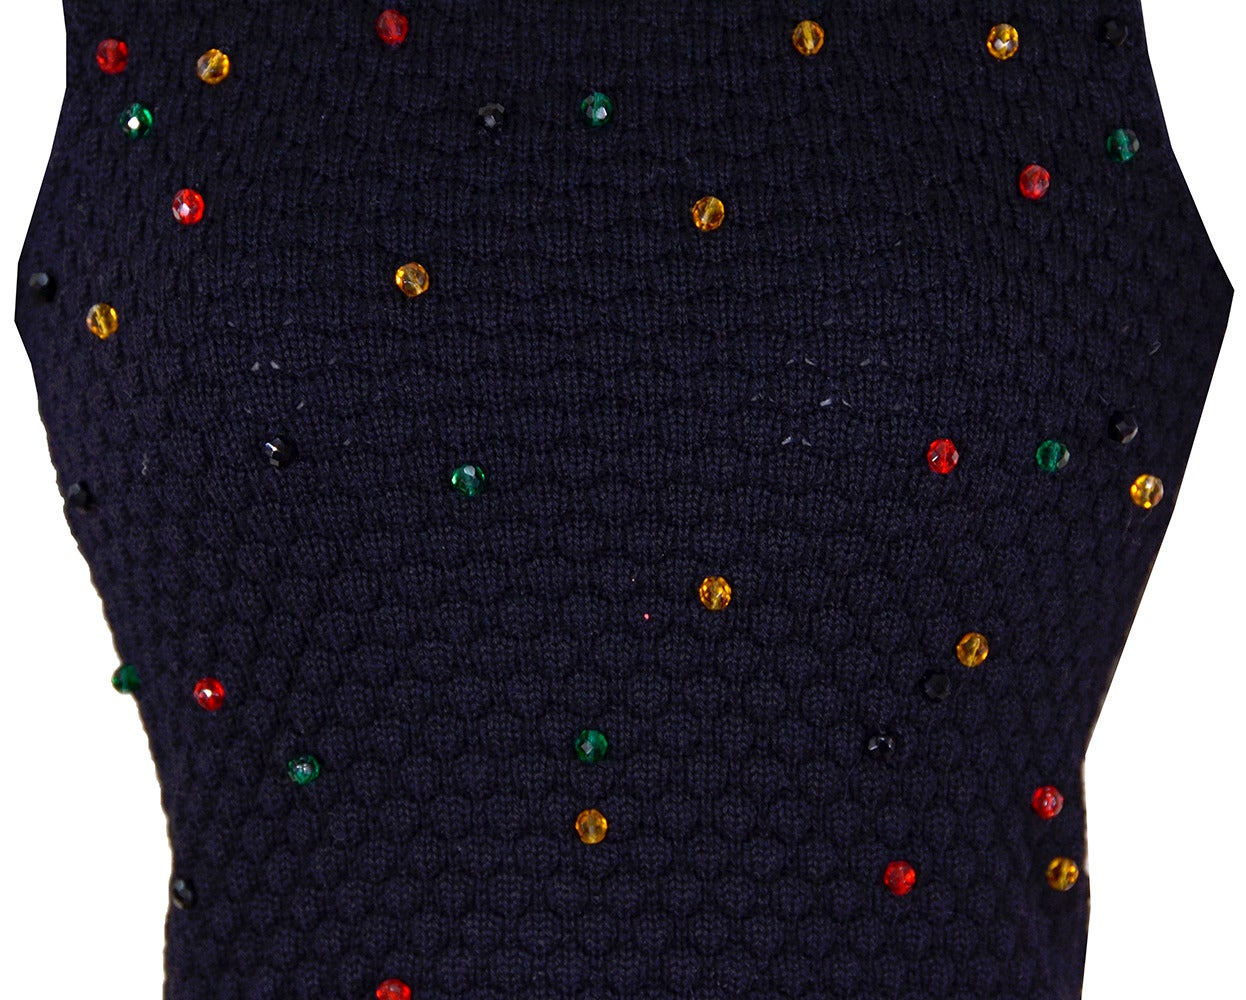 8c08ea5a2c1d35 Stunning YSL, Yves Saint Laurent fine Merino wool, beaded sweater set. Black  background